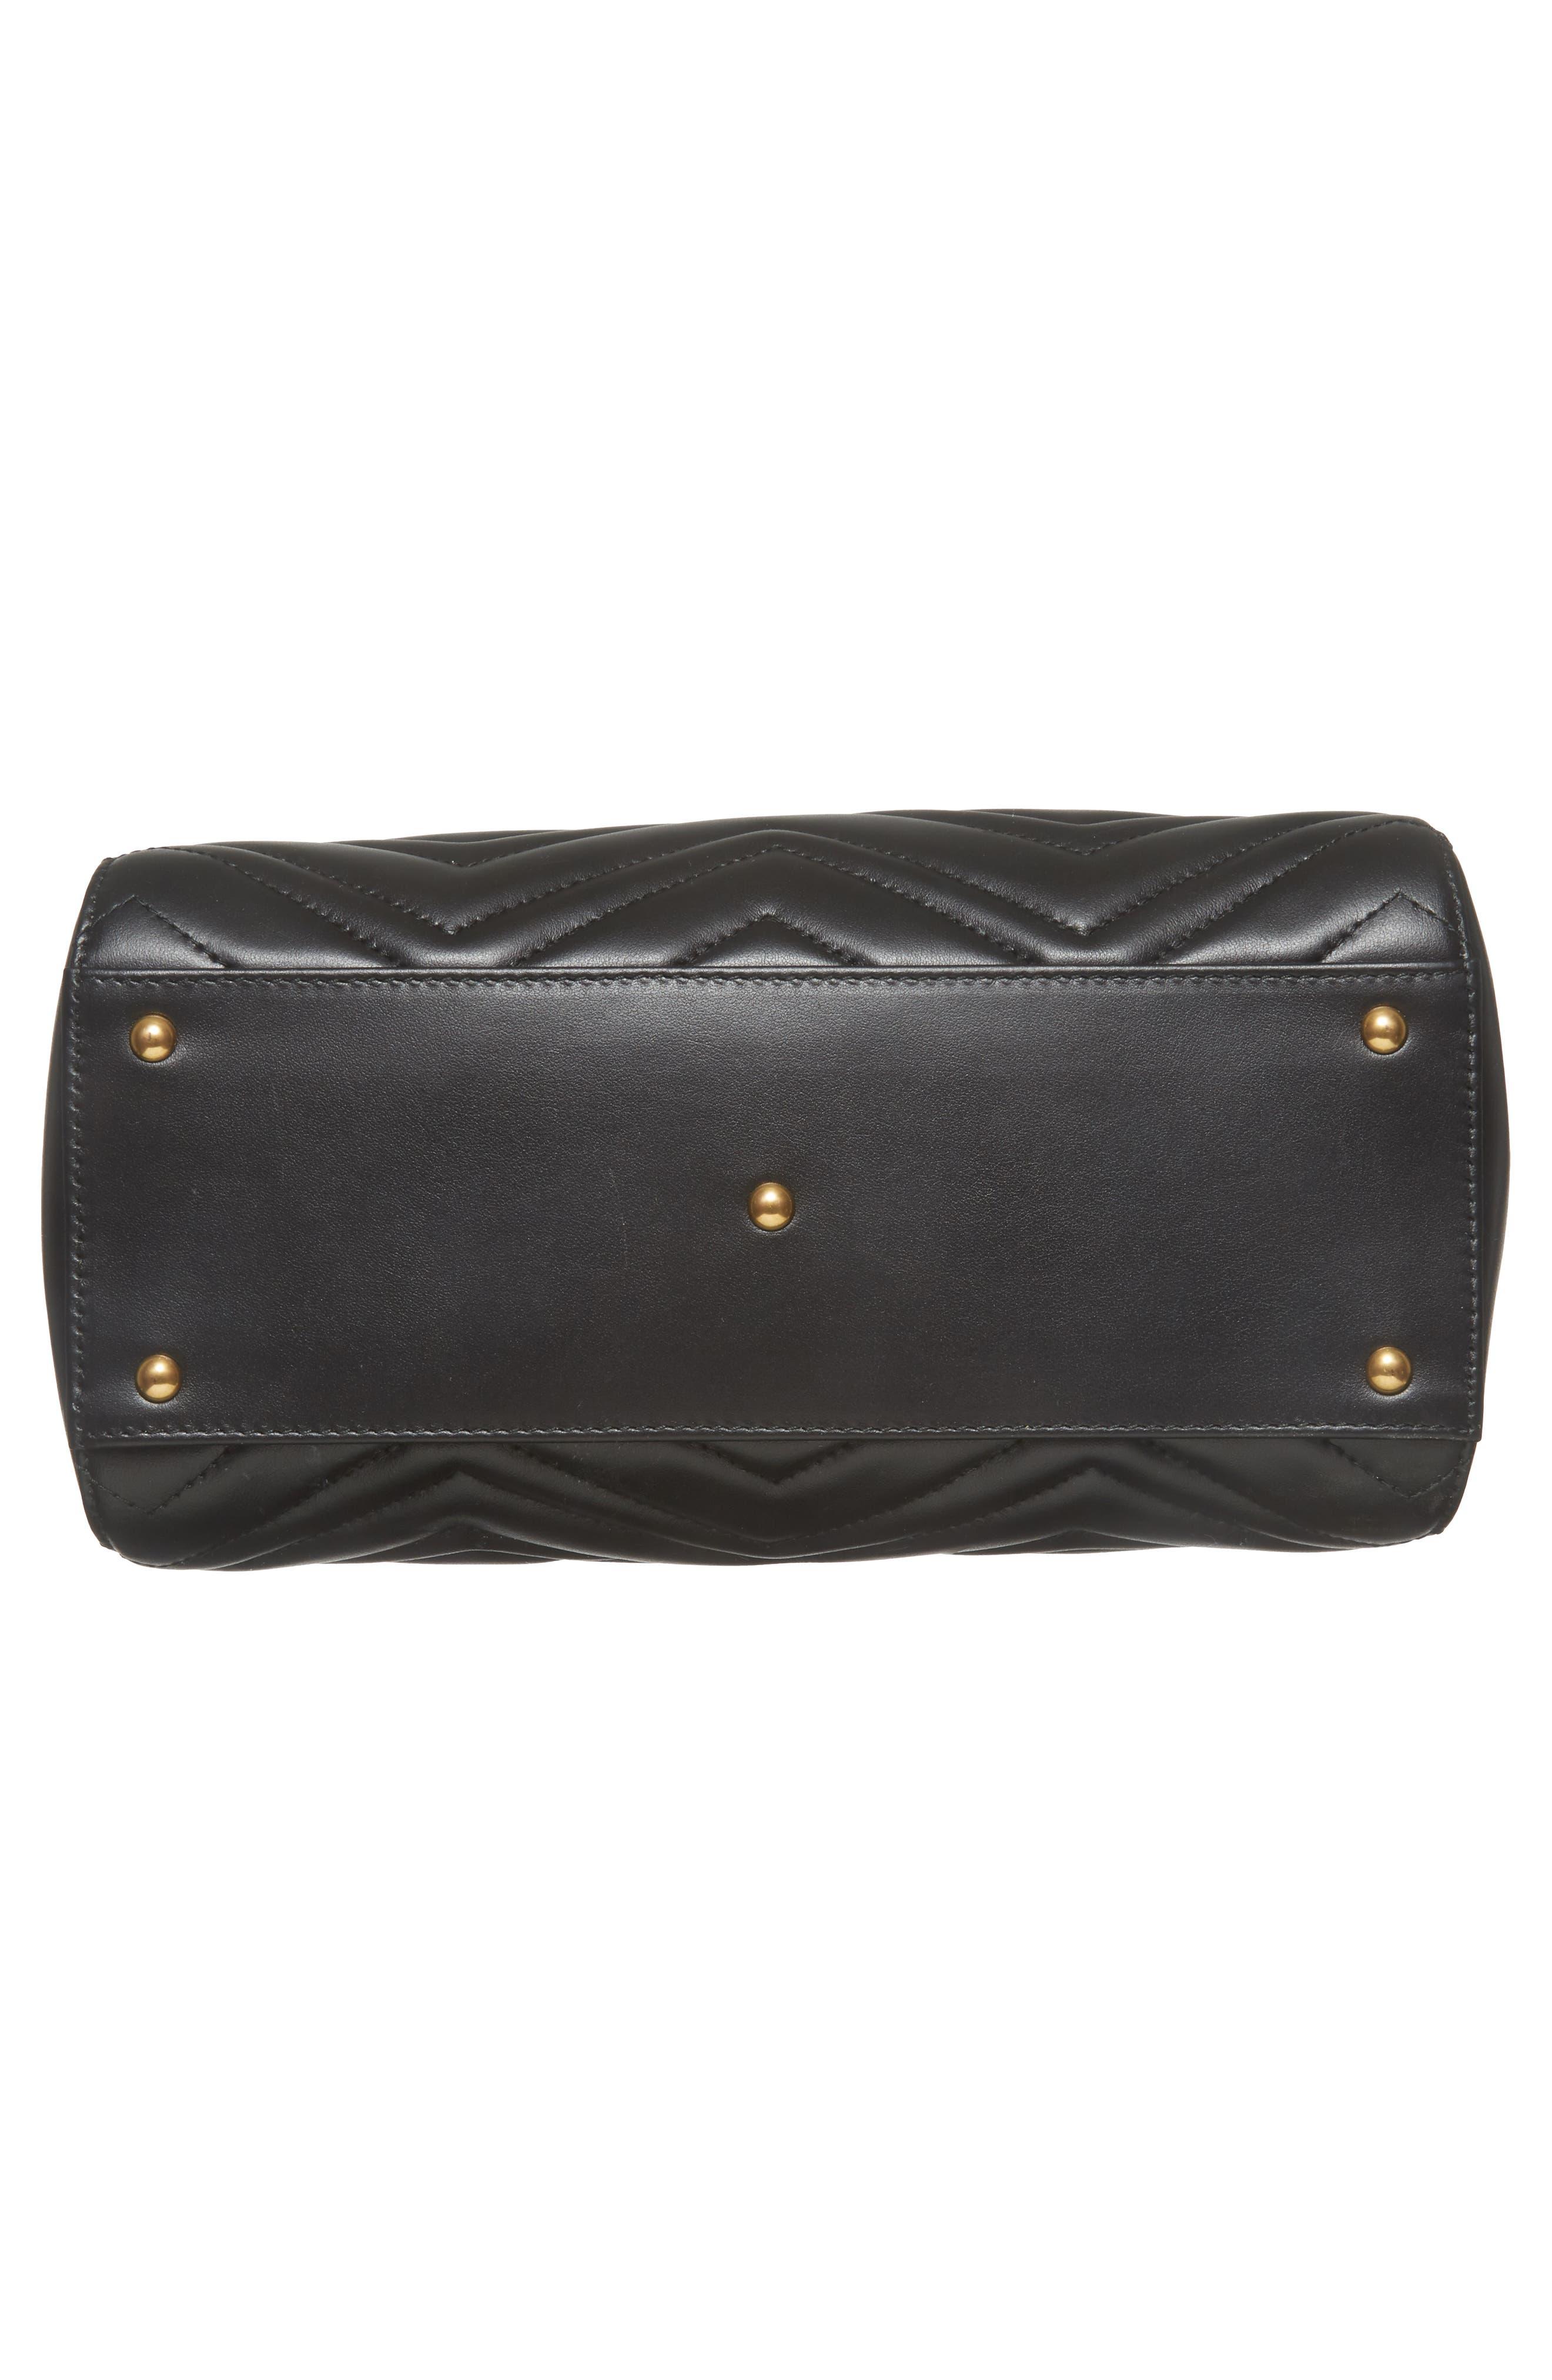 GG Small Marmont 2.0 Matelassé Leather Top Handle Satchel,                             Alternate thumbnail 6, color,                             Nero/ Nero